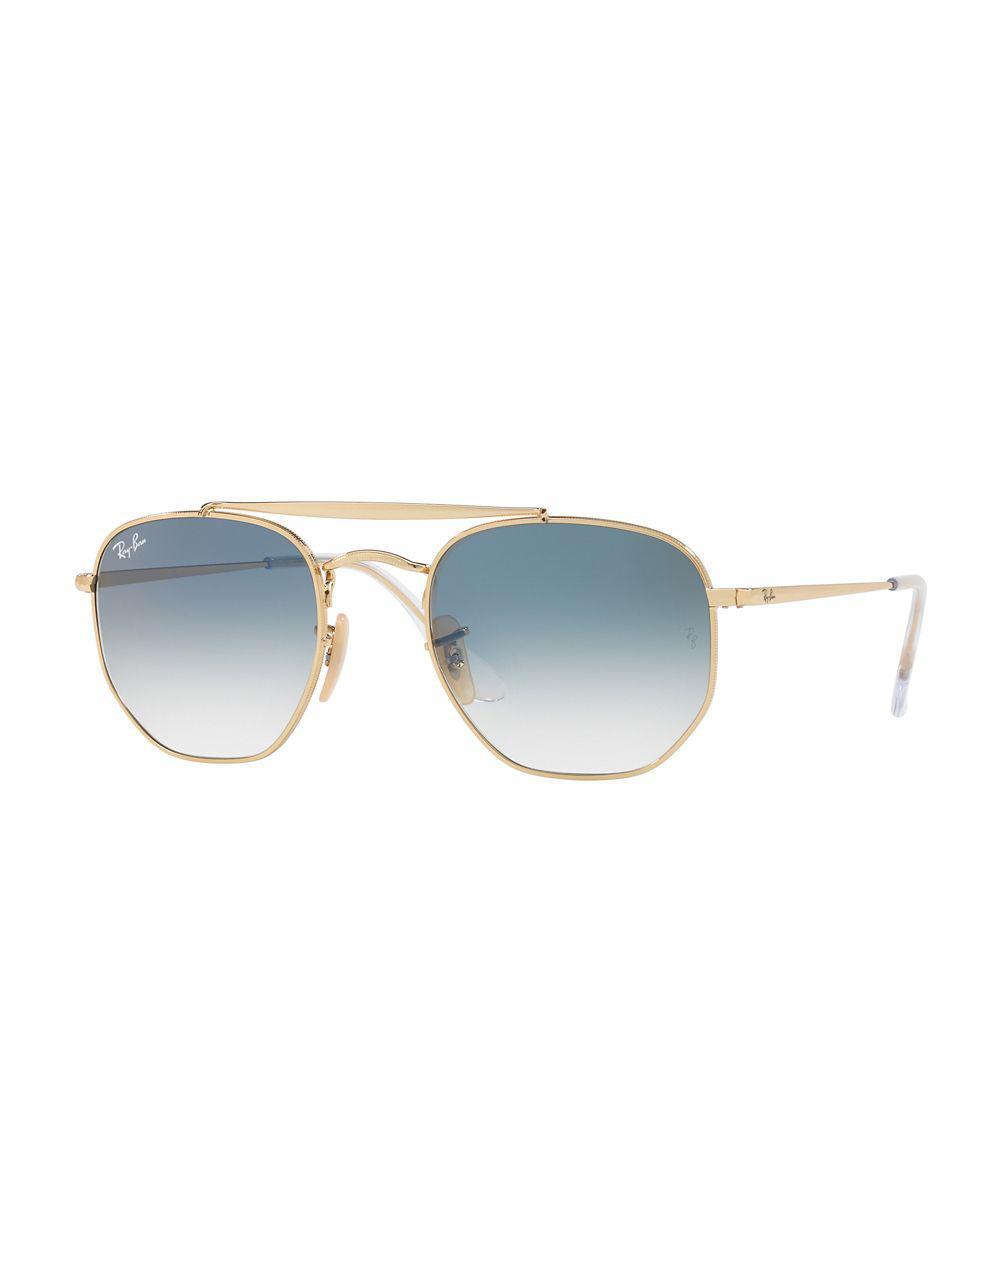 6080836e00 Lyst - Ray-Ban 51mm Square Sunglasses in Blue